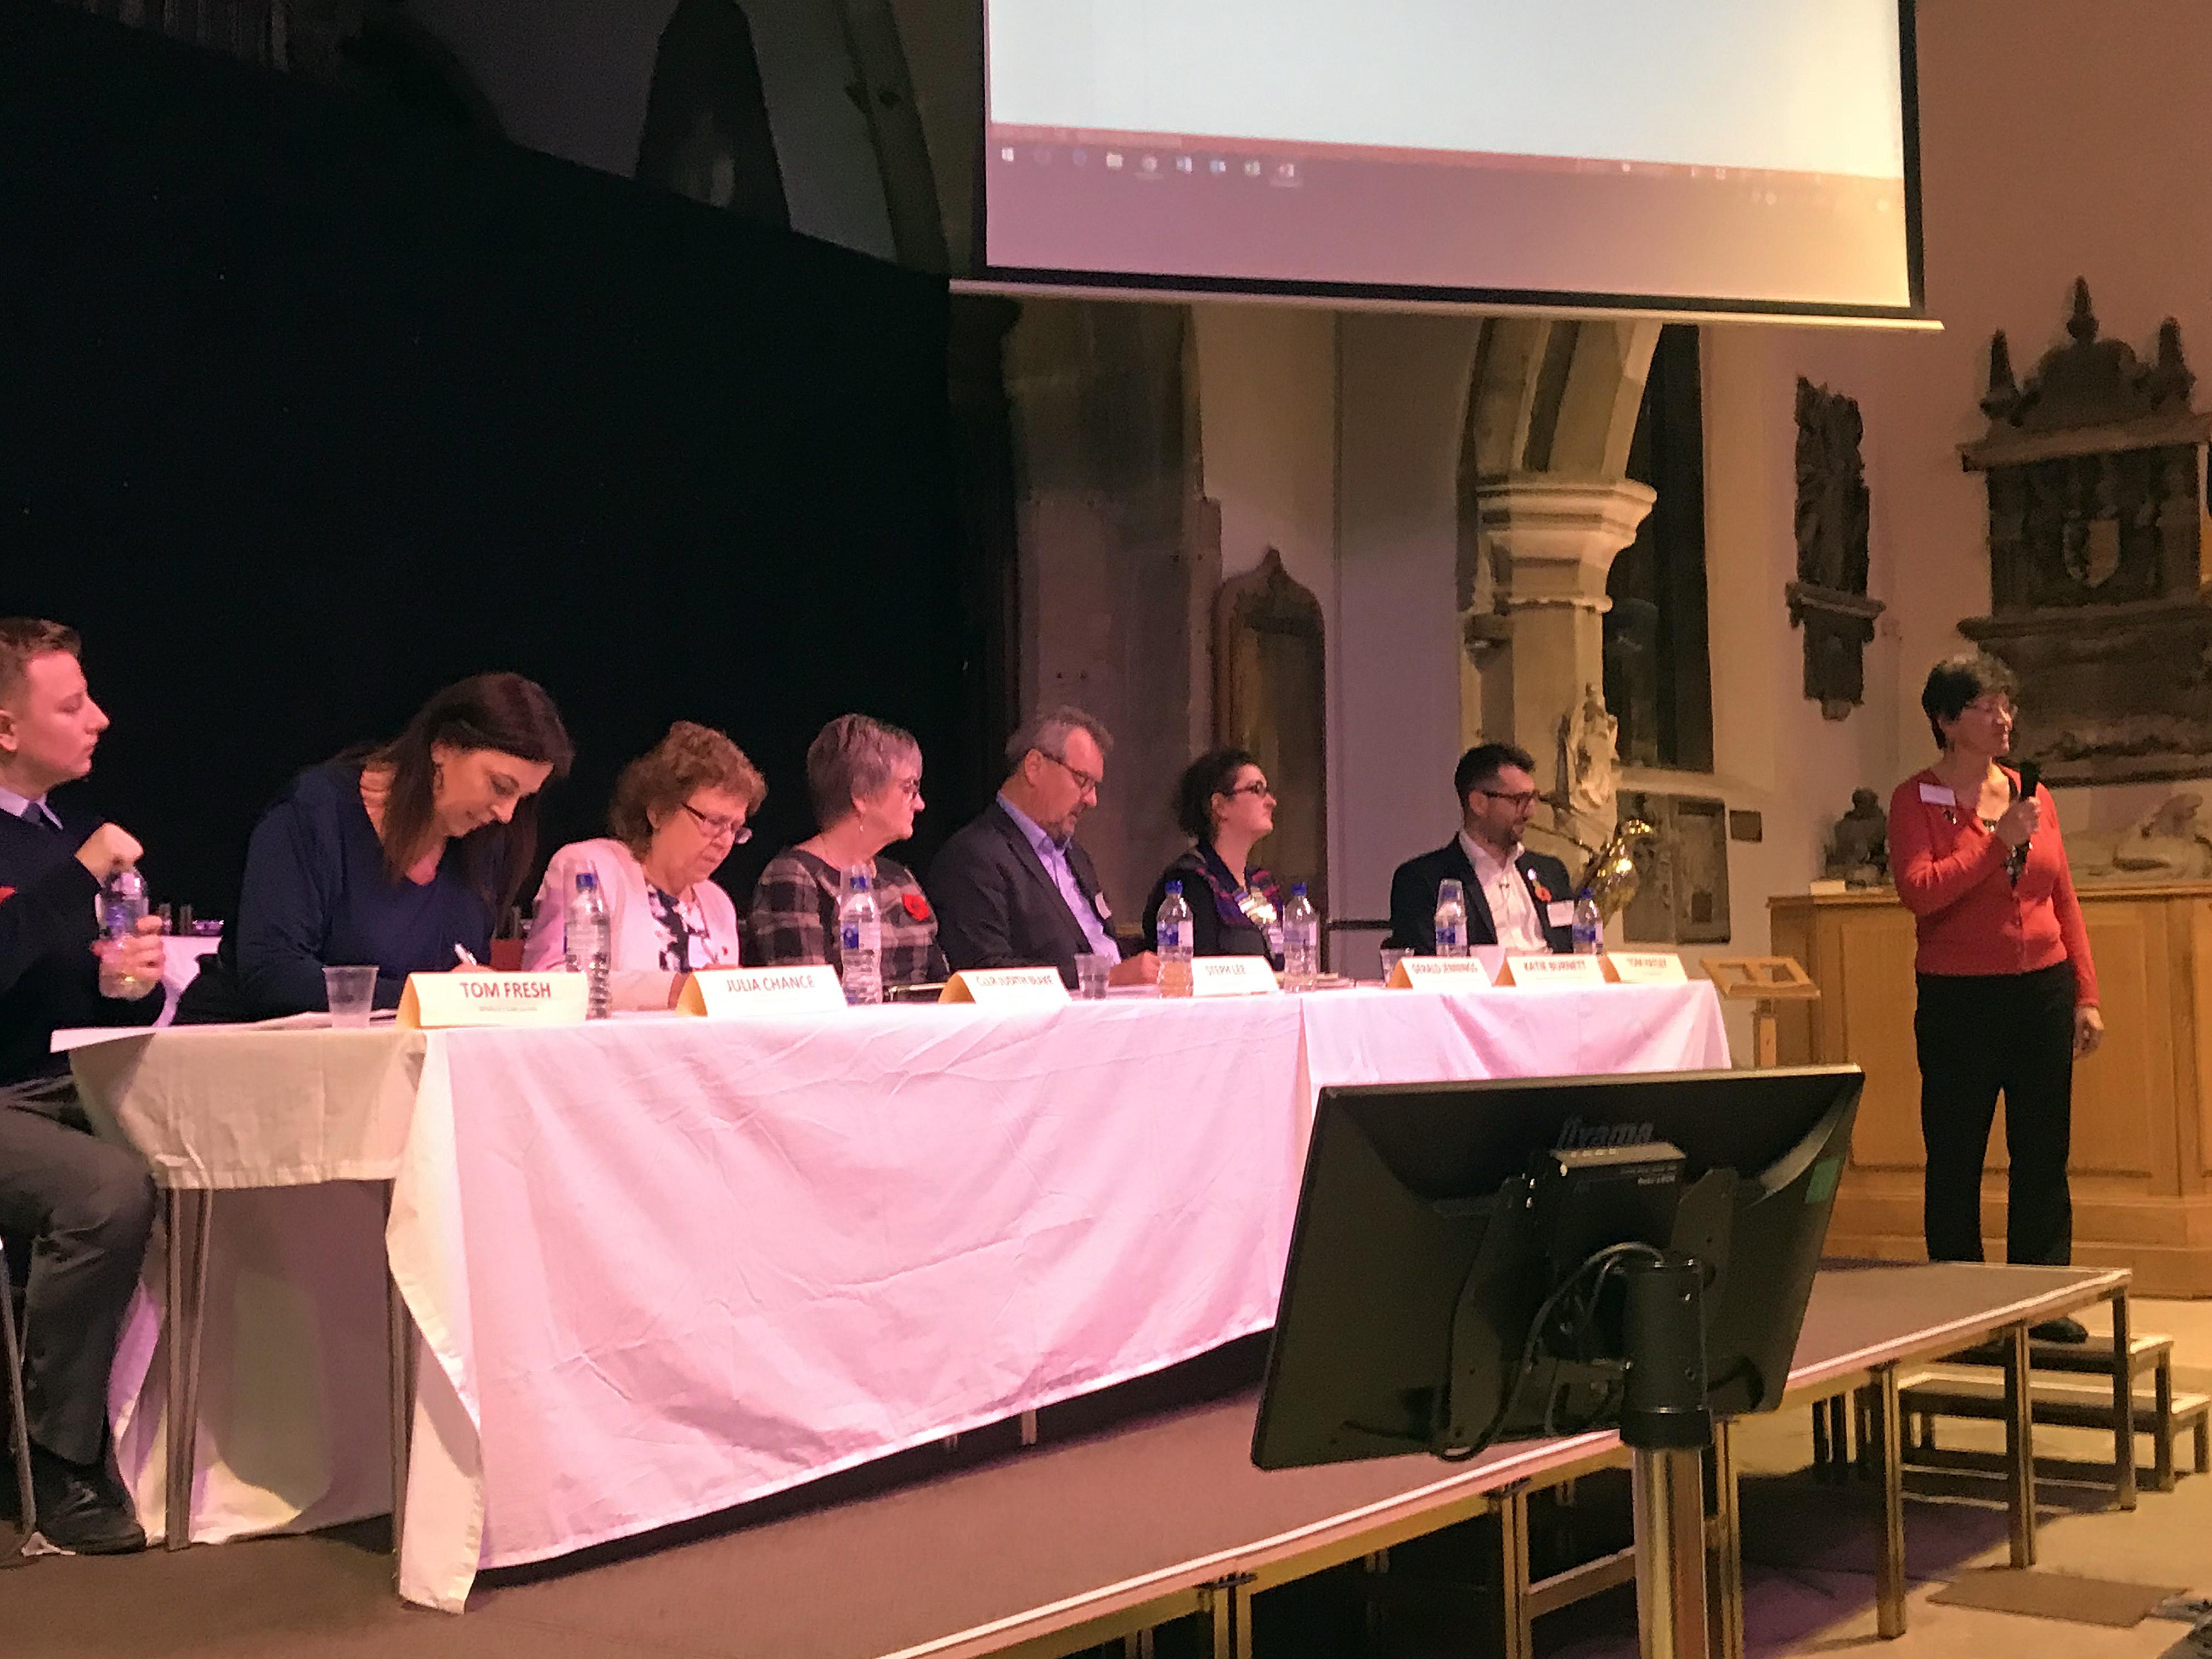 Otley Summit Panel, Otley Bid, West Yorkshire